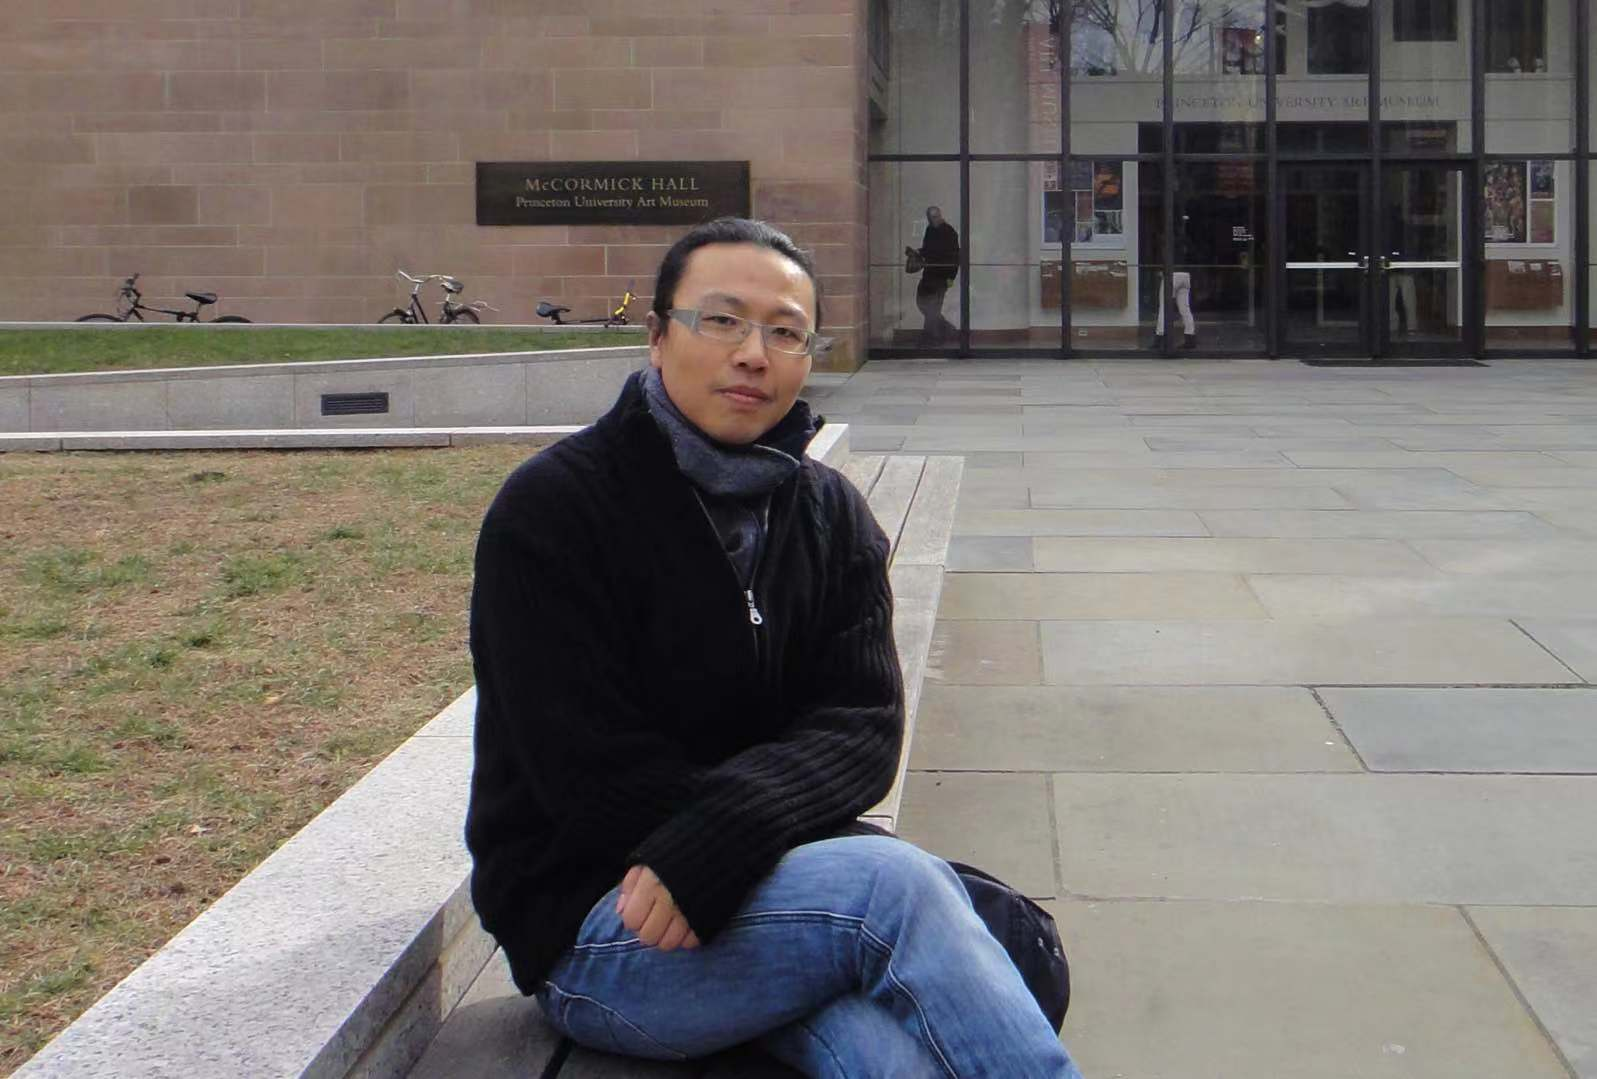 薛峰  博士,南京艺术学院教授、硕士生导师、跨媒体艺术工作者 现工作生活于南京  广泛涉足媒体、设计、动画及相关文化创意产业等领域,作品先后在国内和国际活动中多次入选并获奖。从事影视及新媒体动画与漫画相关工作十余年,并长期致力于适应现代传播规律的动画艺术理论与实践、及高校学产整合模式的相关研究。  2013年开始着眼于当代艺术领域的艺术创作,撰写教材与专著六部、发表各类学术论文、评论十余万字、个人作品在国际国内各类比赛和展演中获奖;在长期从事产业动画项目的研发、创作的同时开展了一系列相关交流活动的策展与实施,试图能在院校专业教育、艺术研究、产业探索等方面搭建良性互动的学术性平台,并探寻科学性的运行模式;将设计性思维与观念艺术、影像艺术语言相互融合,拓展艺术创作更多可能。  Xue Feng  Xue Feng hold a Ph.D, and he is a professor and a Master supervisor at Nanjing University of Arts. He is also a multimedia artist. Now he lives and works in Nanjing.  He has a wide range of expertise in the fields of media, design, animation and other related fields in creative industries. His works have been nominated and awarded numerous awards in China and abroad. He has been working on film, new media animation and comics-related work for more than ten years, and has been dedicating himself to animation art theory and practice that follow the rule of modern communication, and research on the integration model of colleges' resources.  He has been active in contemporary art since 2013. He wrote six textbooks and monographs, and published a variety of academic papers, more than 100,000 words of commentaries. His works won prizes in various international and domestic competitions and performances. While he was working on the creation and development of animation projects, he also curated a series of events that focuses on communication, attempting to build academic platform with positive interactions in professional education in colleges, artistic research and industrial exploration, and find the scientific operation model, and eventually, combine design thinking with conceptual art, cinematic language to explore the possibilities of artistic creation.